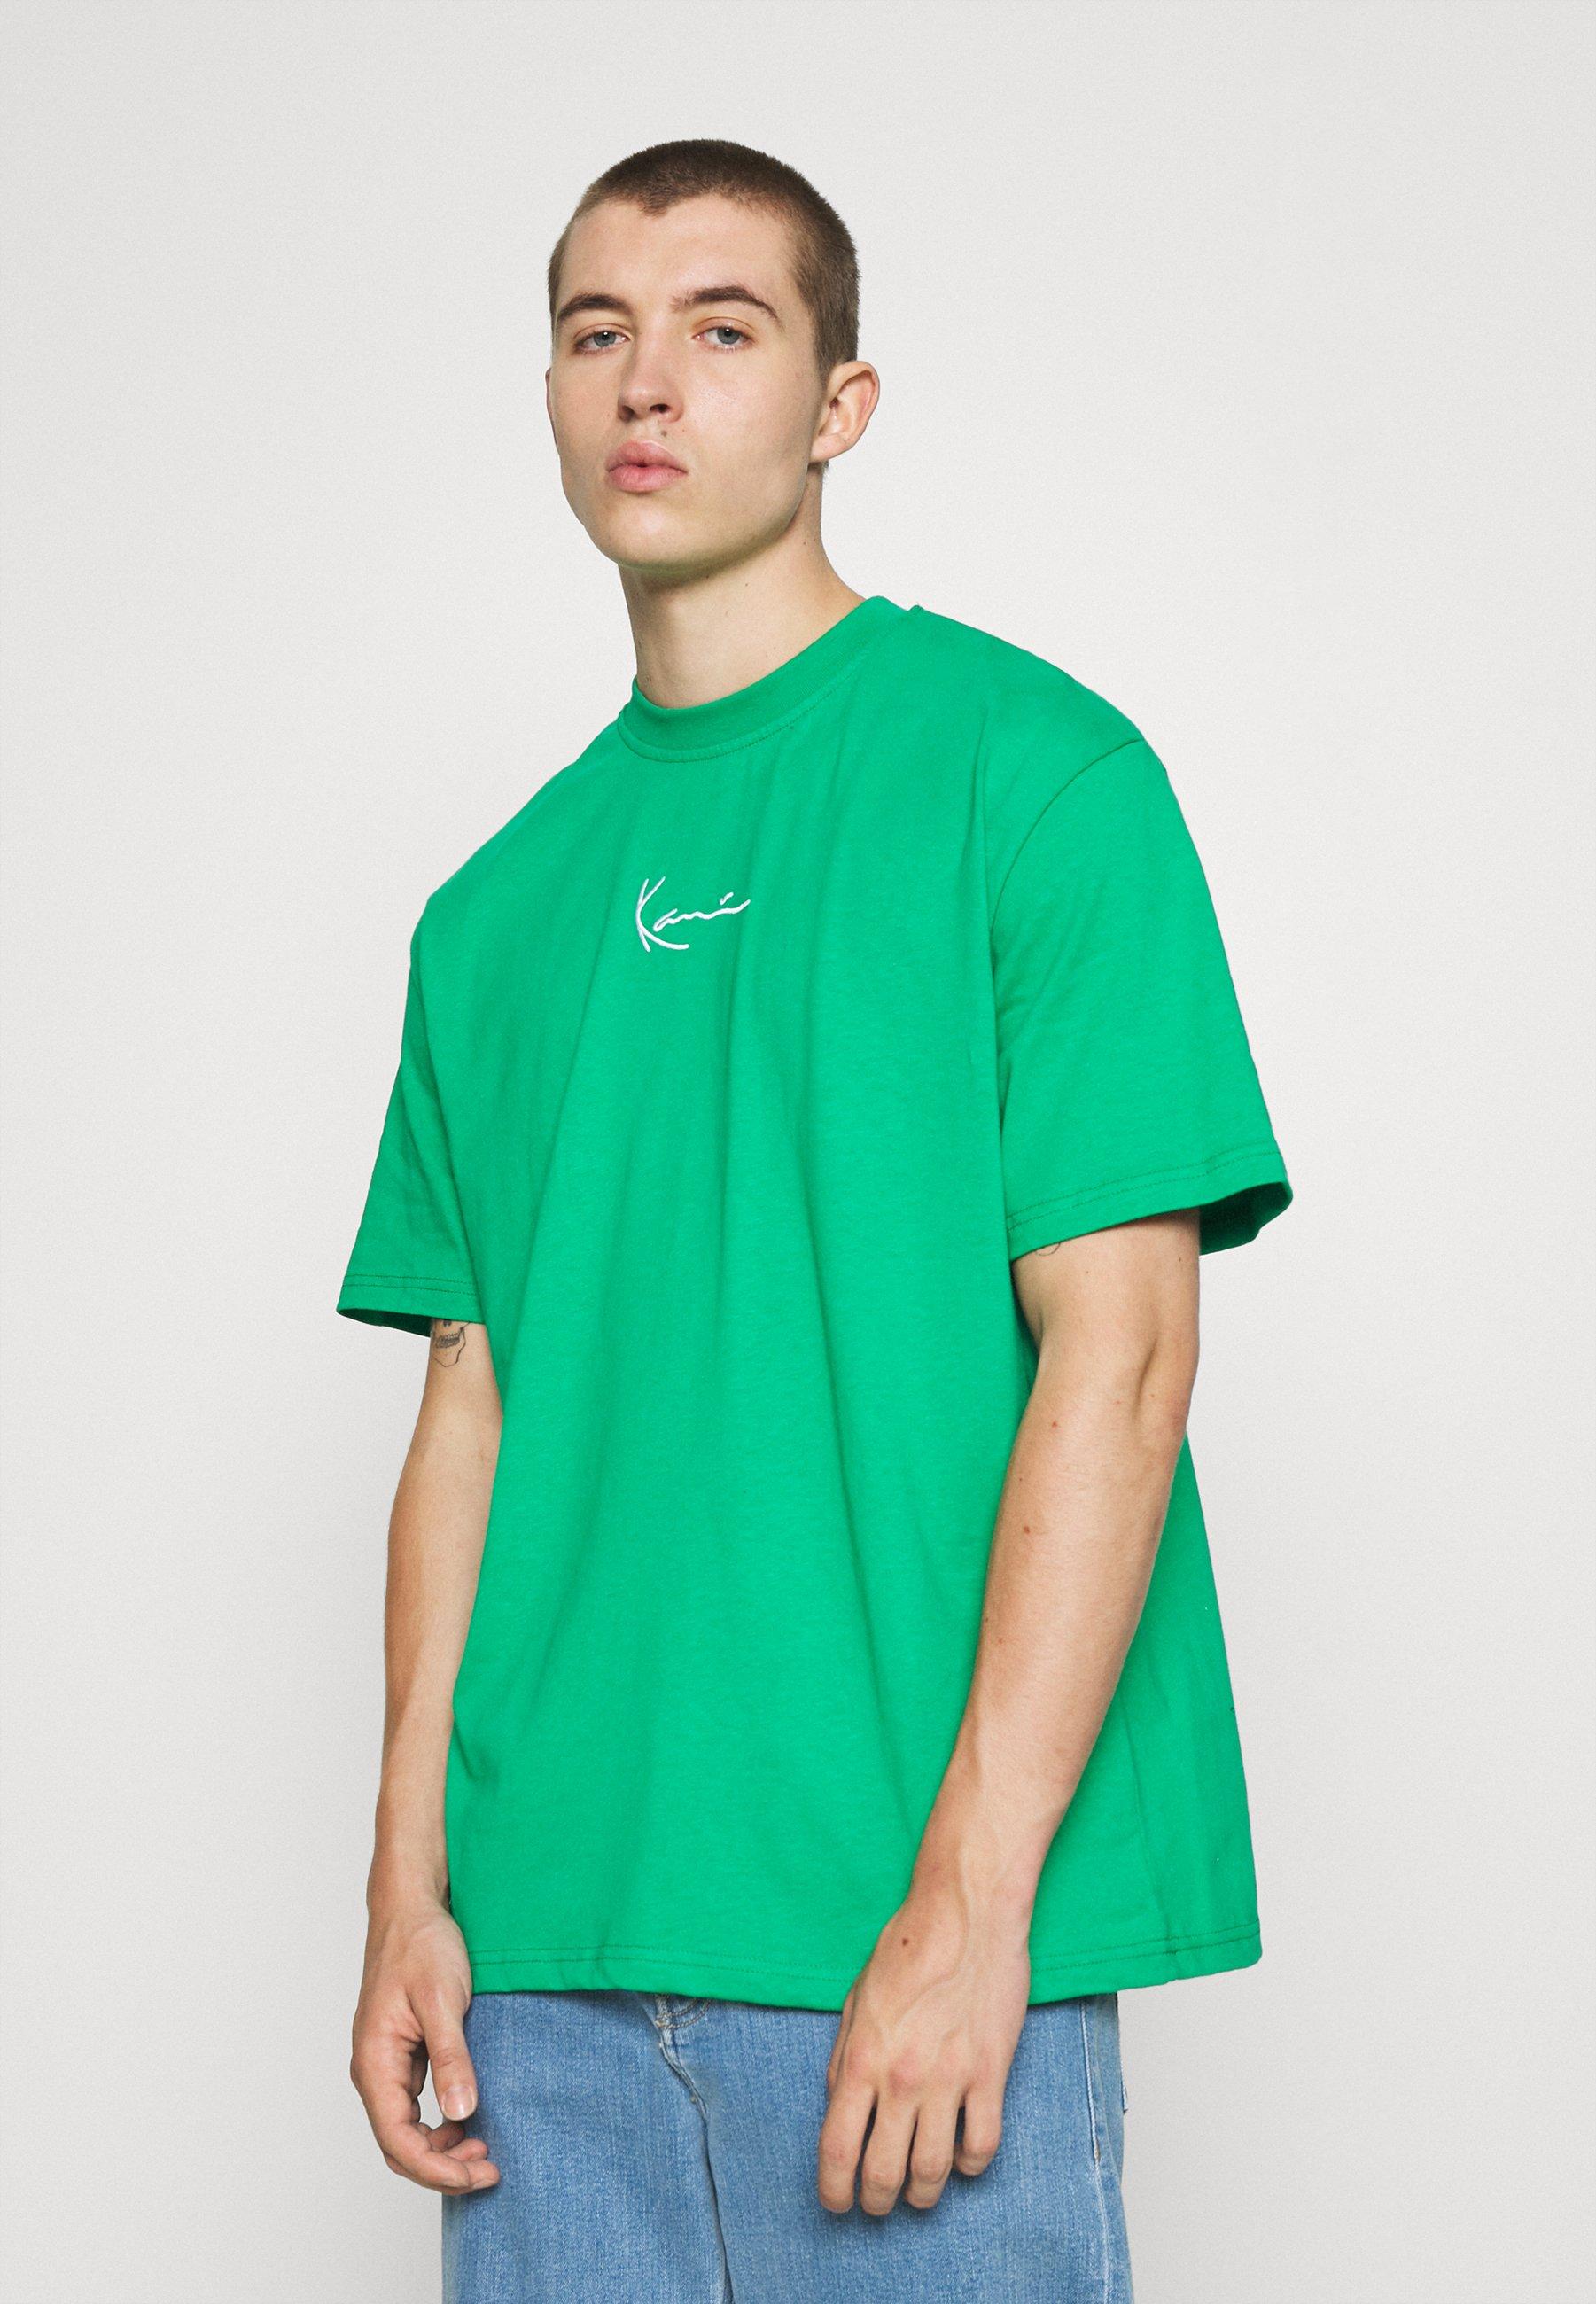 Women SMALL SIGNATURE TEE GREEN UNISEX  - Basic T-shirt